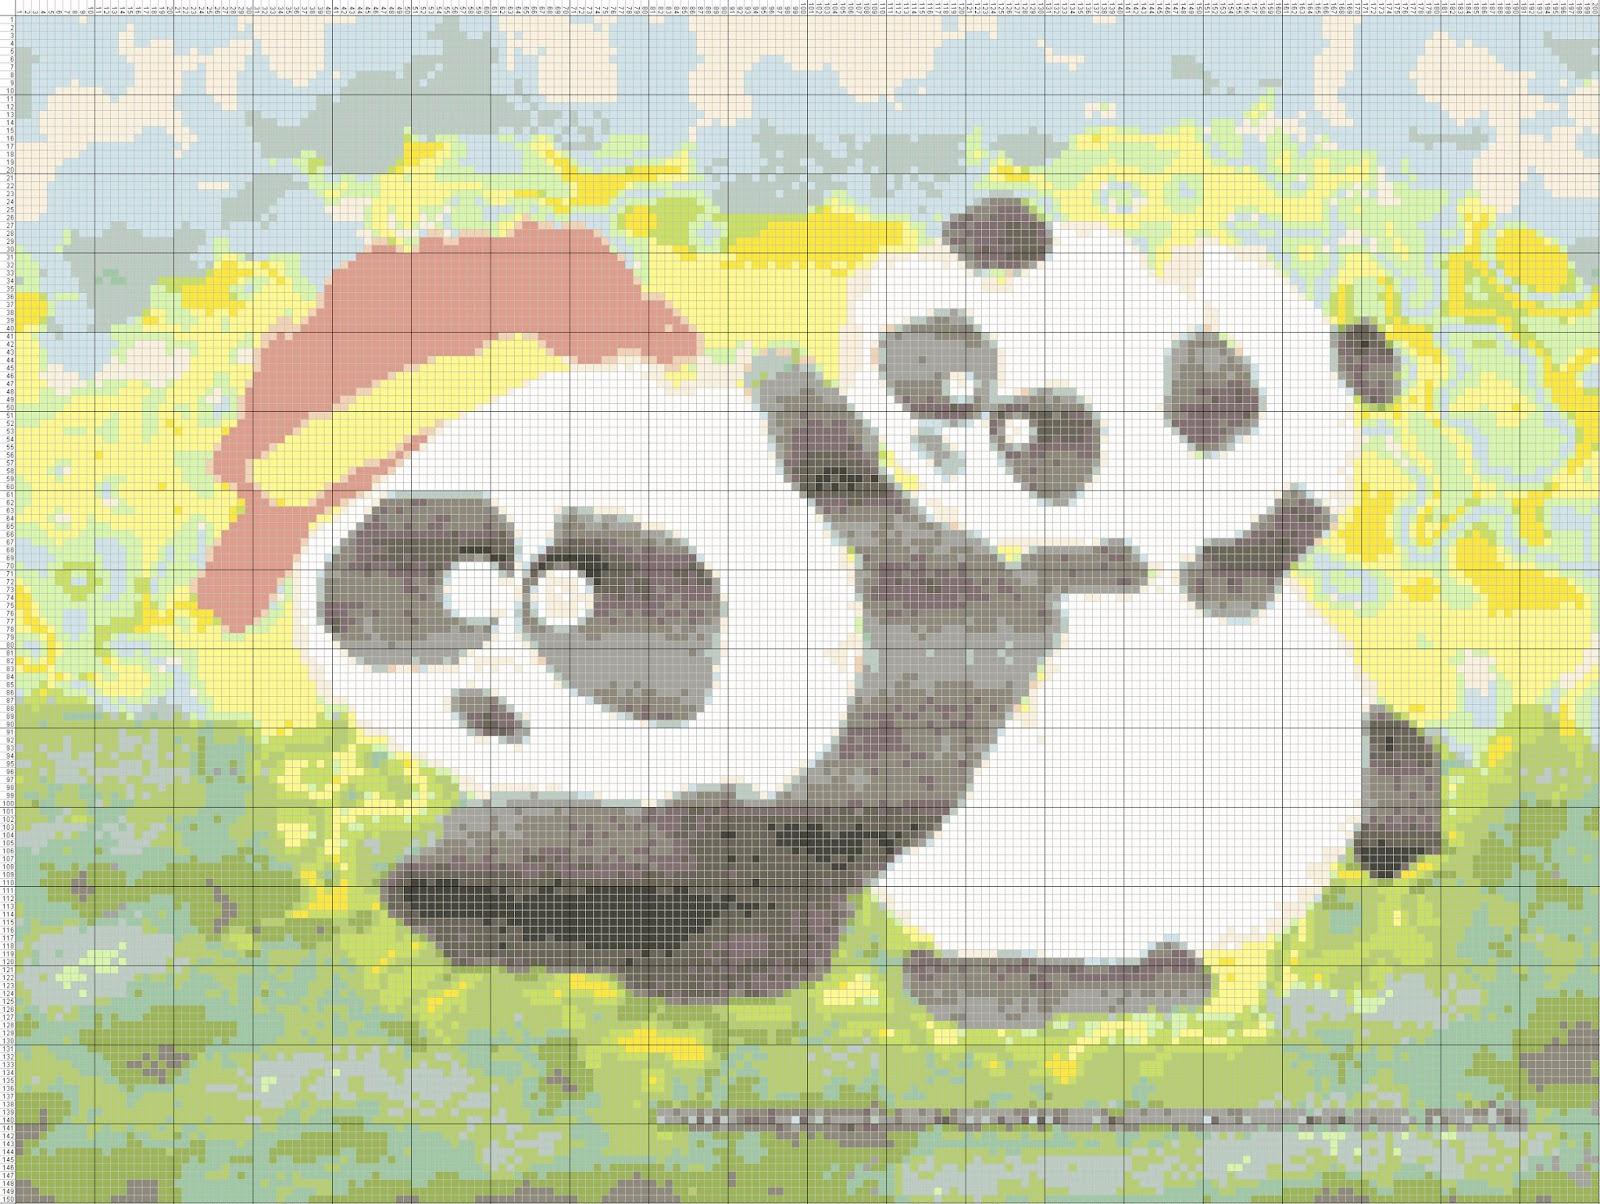 Http://gambar-abstrak.blogspot.com/2013/04/gambar-abstrak-5-panda.html